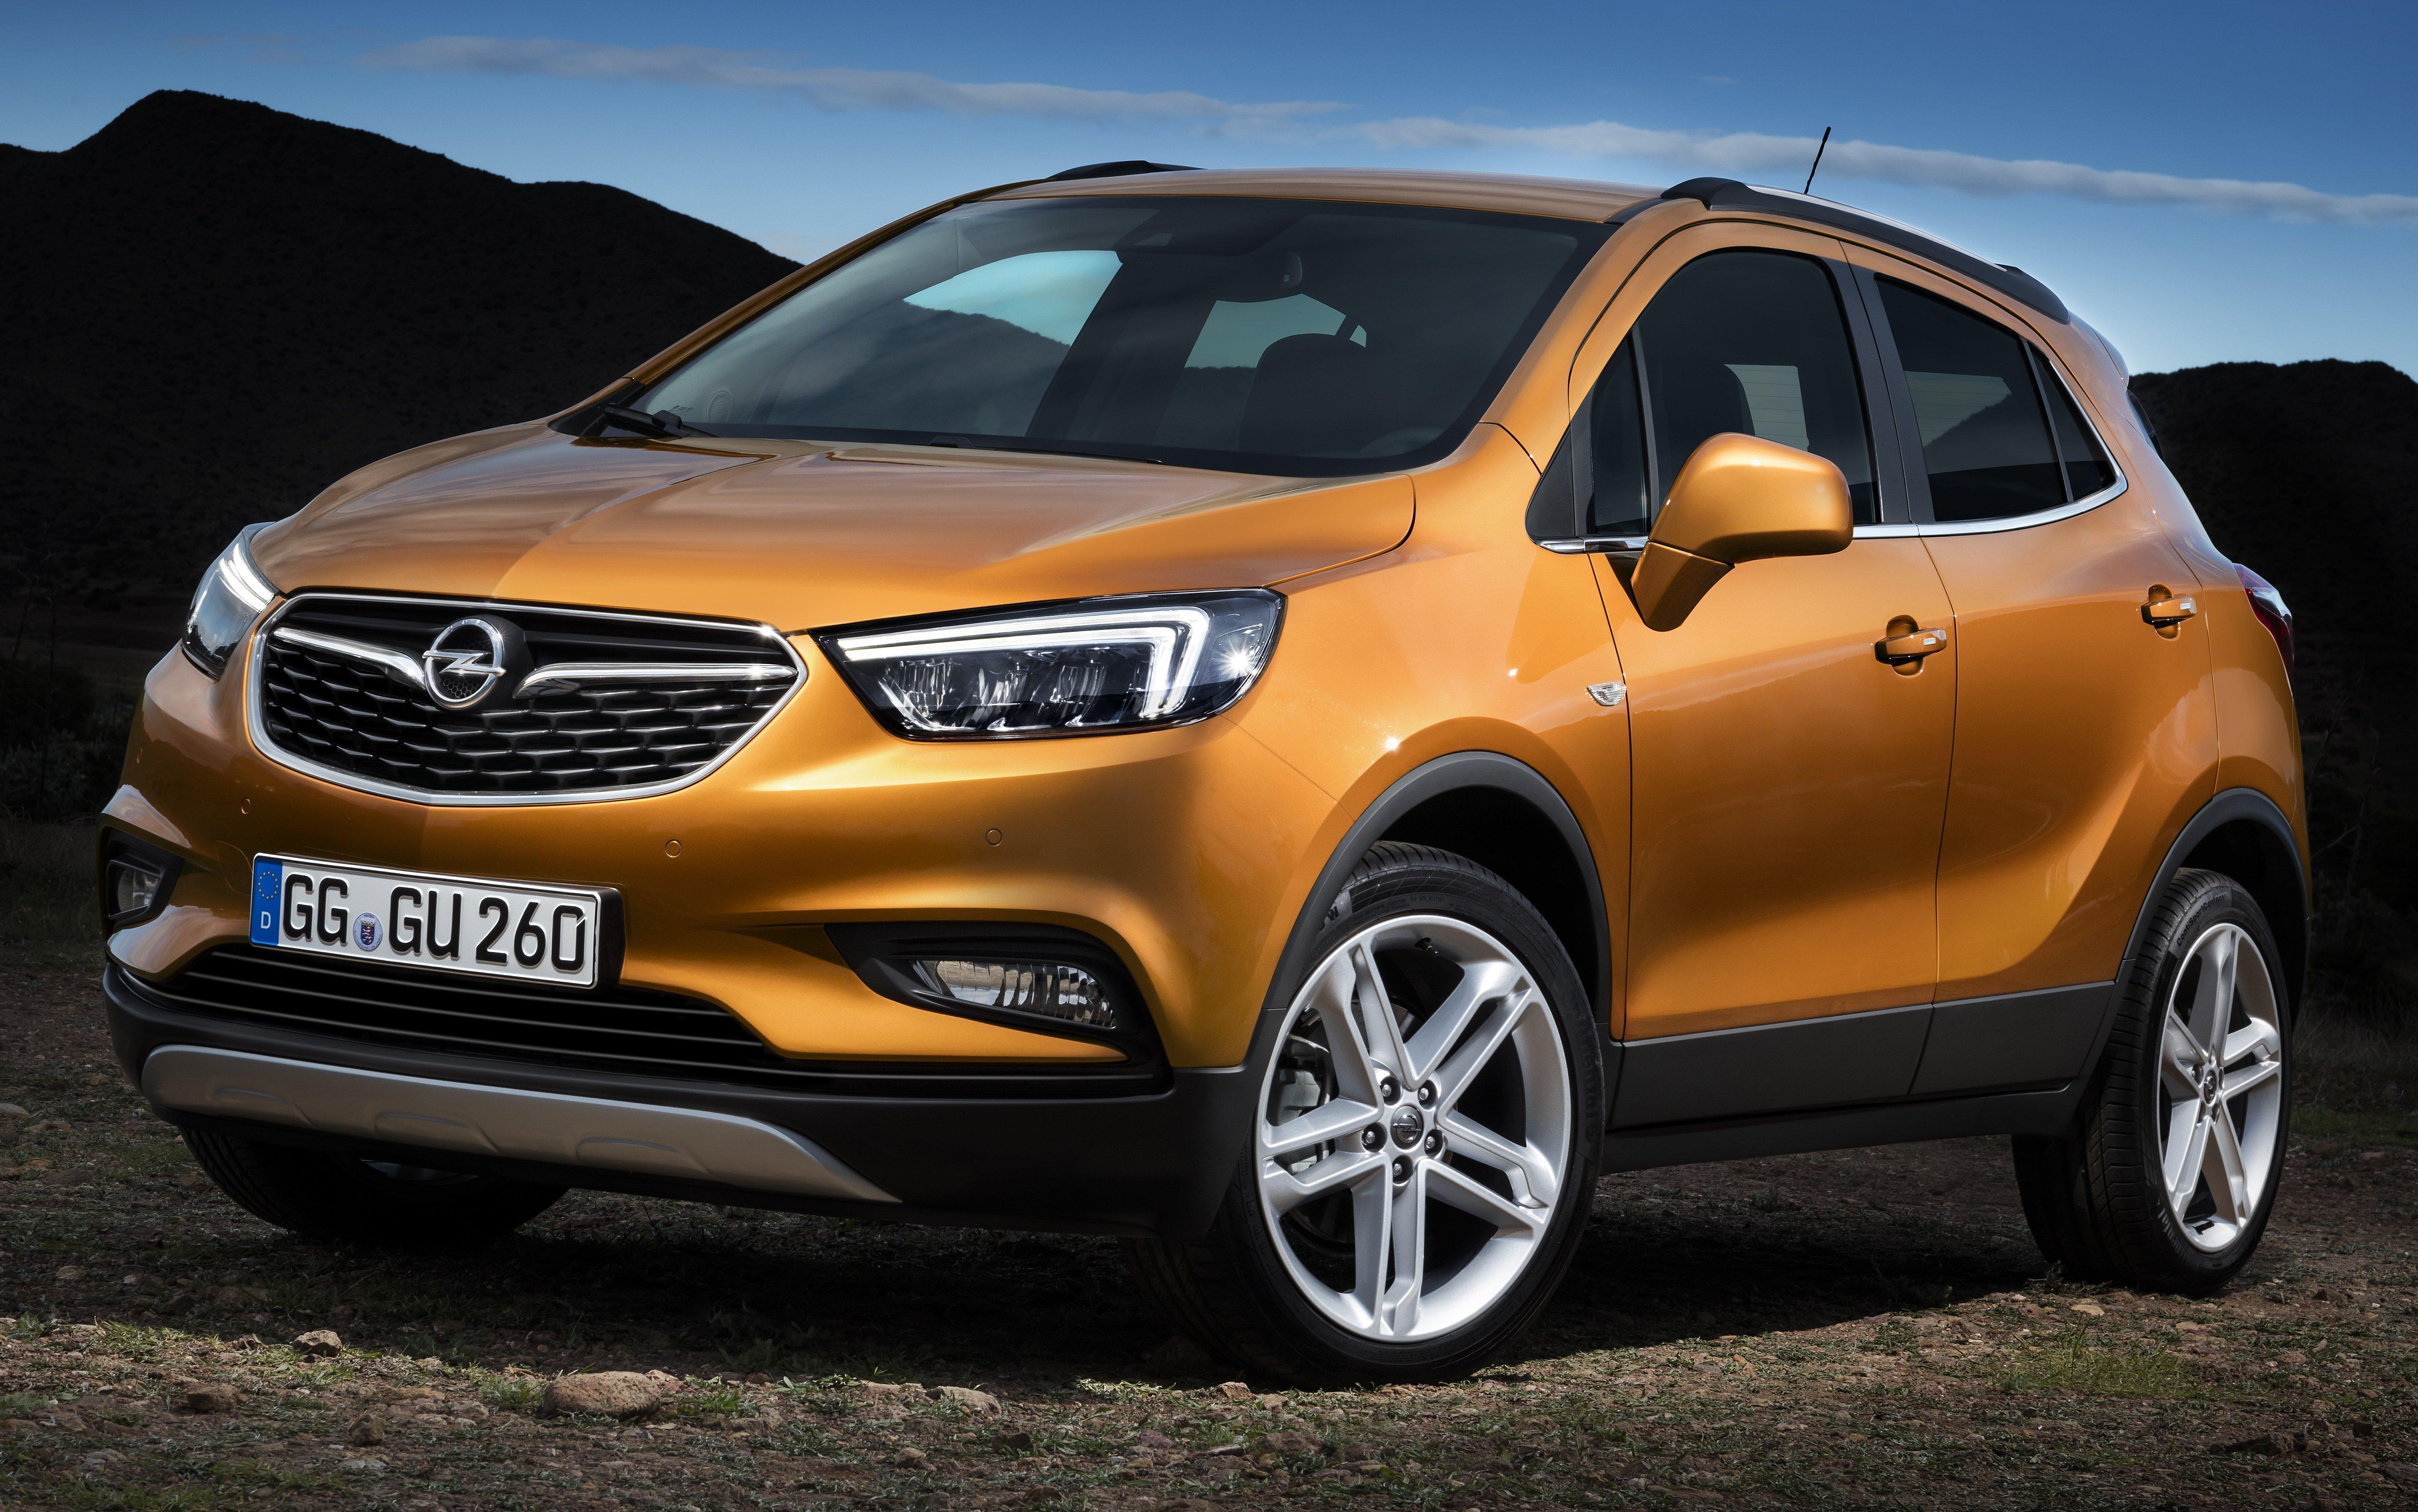 Opel Mokka 2018 >> Opel/Vauxhall Mokka X – B-segment SUV gets facelift Paul Tan - Image 438905